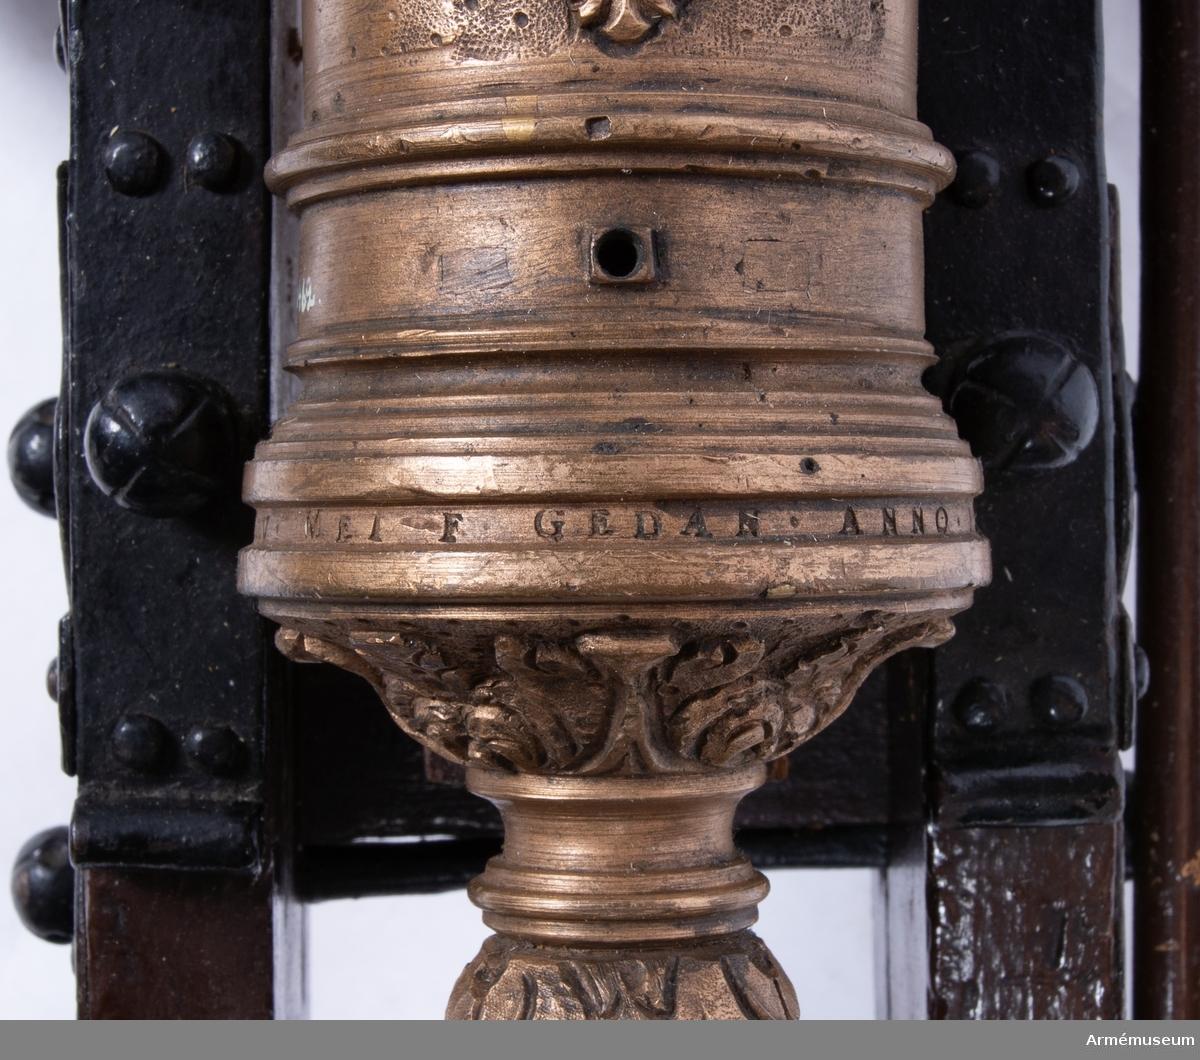 Grupp F I. Modell av 24-pundig kanon, s k ½ kartaun. Skala 1/6. Kapten F A Spaks katalog 1888. I modellen ingår eldrör, lavett, riktspak, riktkil, laddskyffel. Inslaget nr 8. Inskriptionen M W Mei F. Gedan Anno 1666. Sannolikt tillverkad av Michael Weinholdt, Danzig. /W Tepfers.